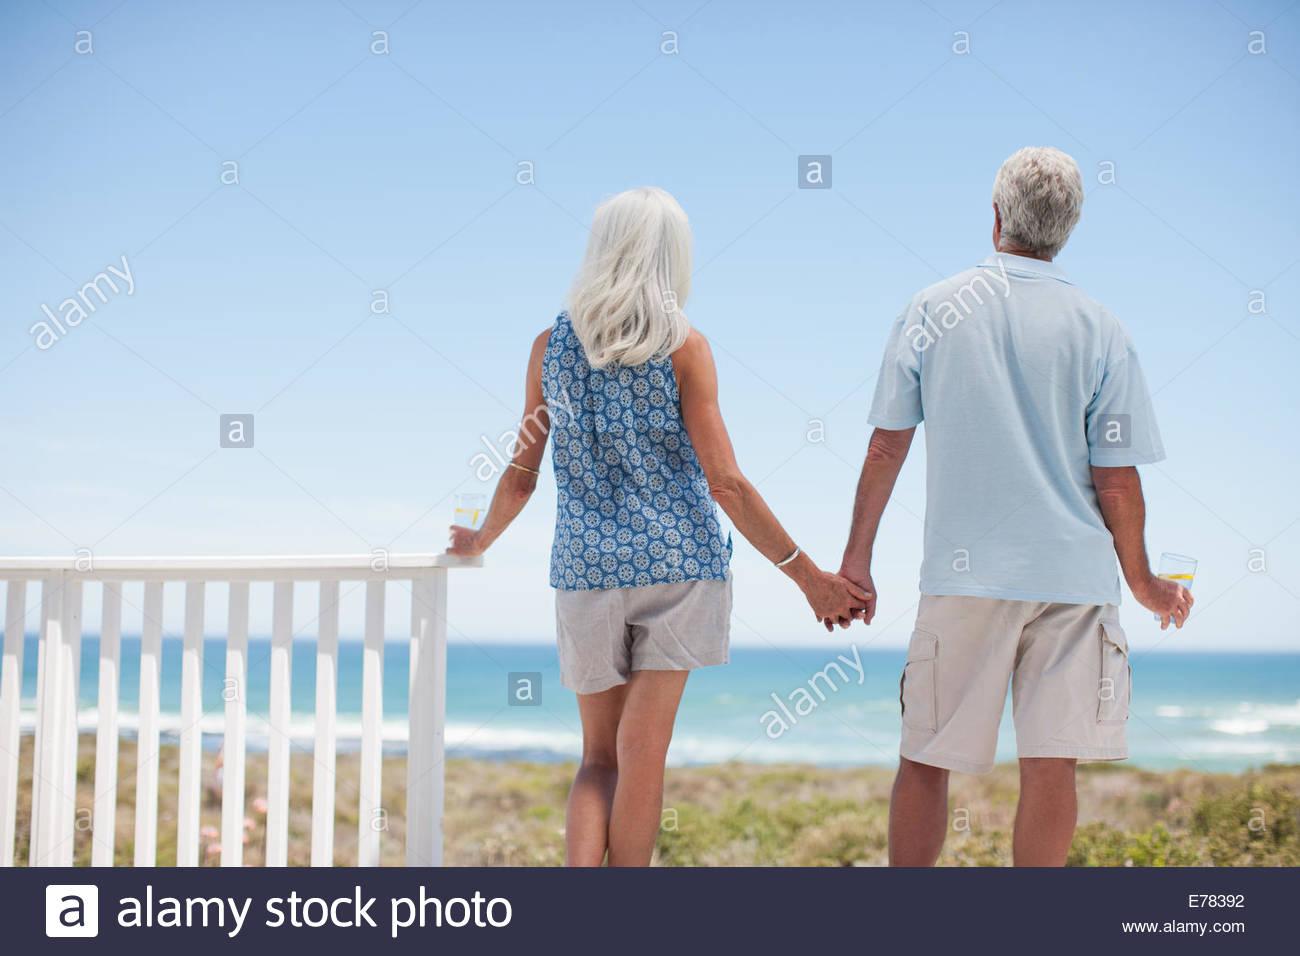 Senior couple holding hands on beach patio Photo Stock